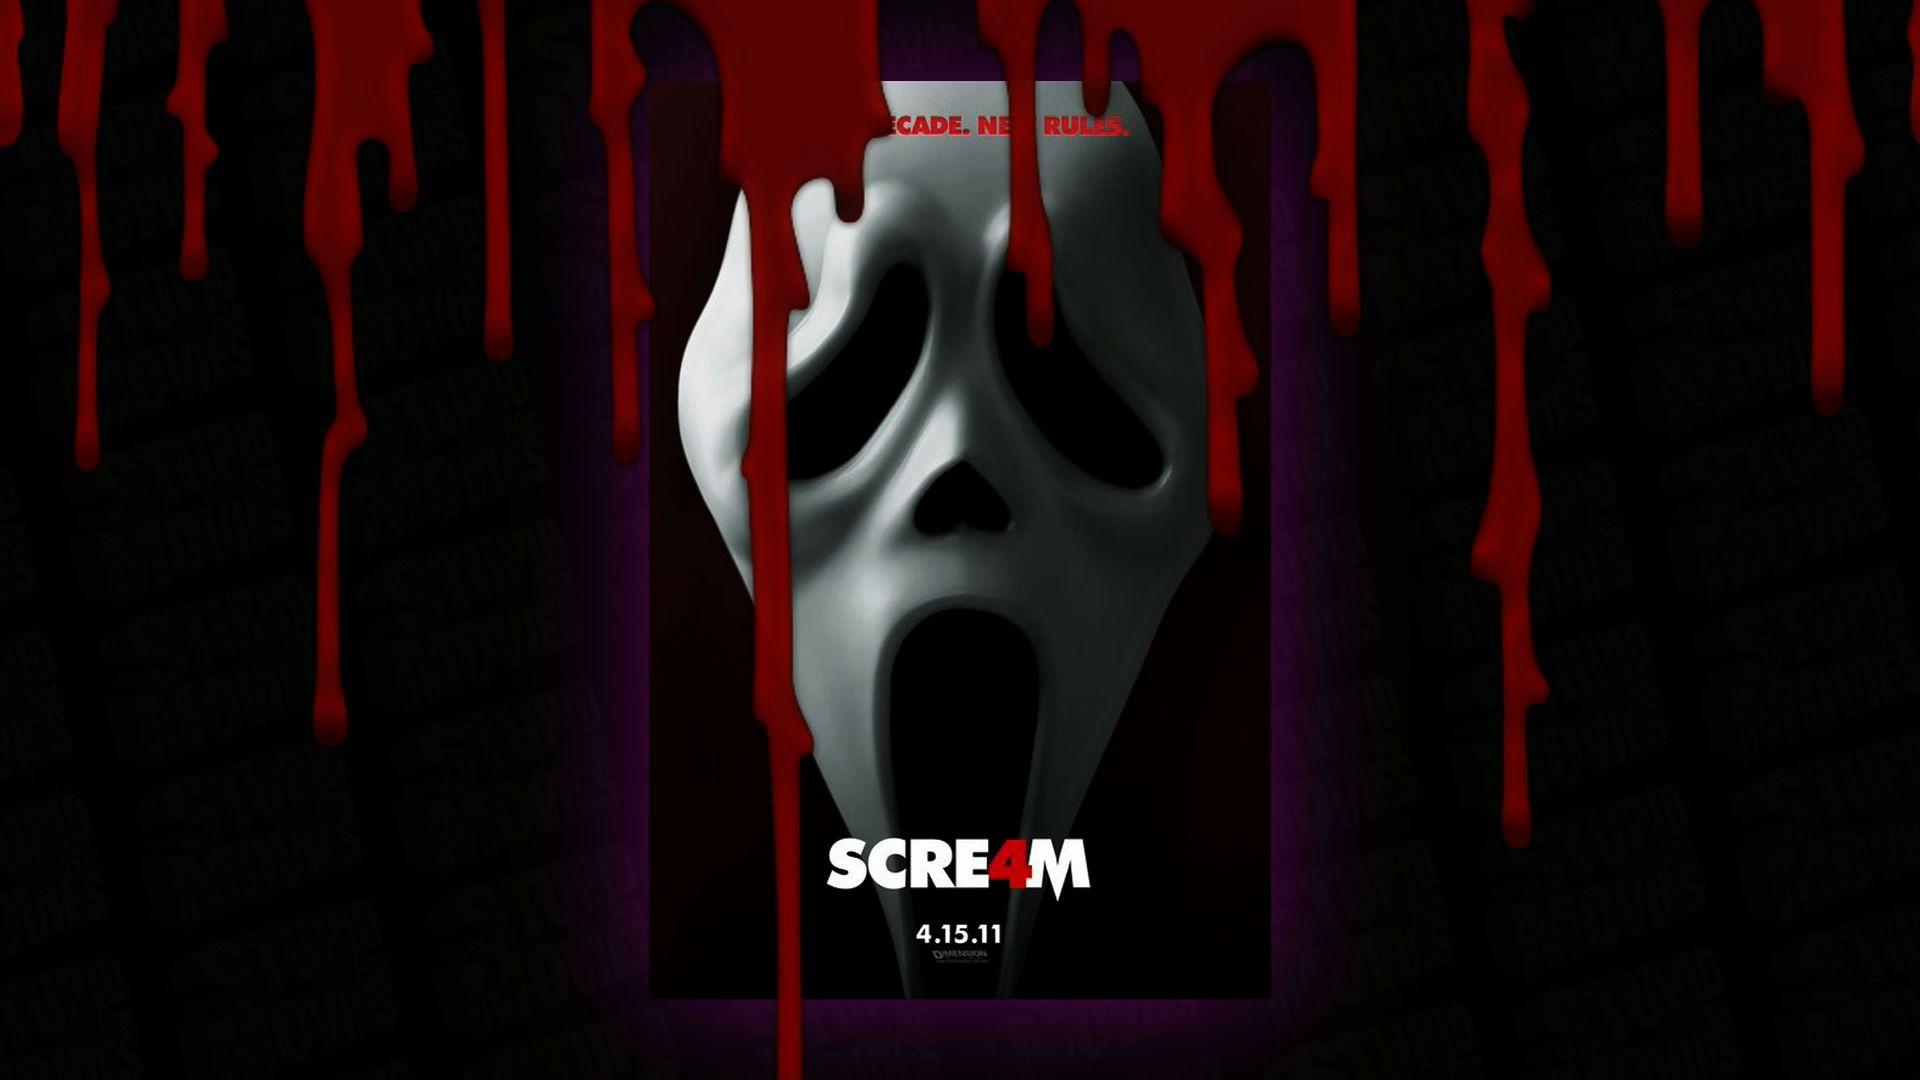 Scream 4 Ghostface Hd Wallpaper 4k Hd Y Pantalla